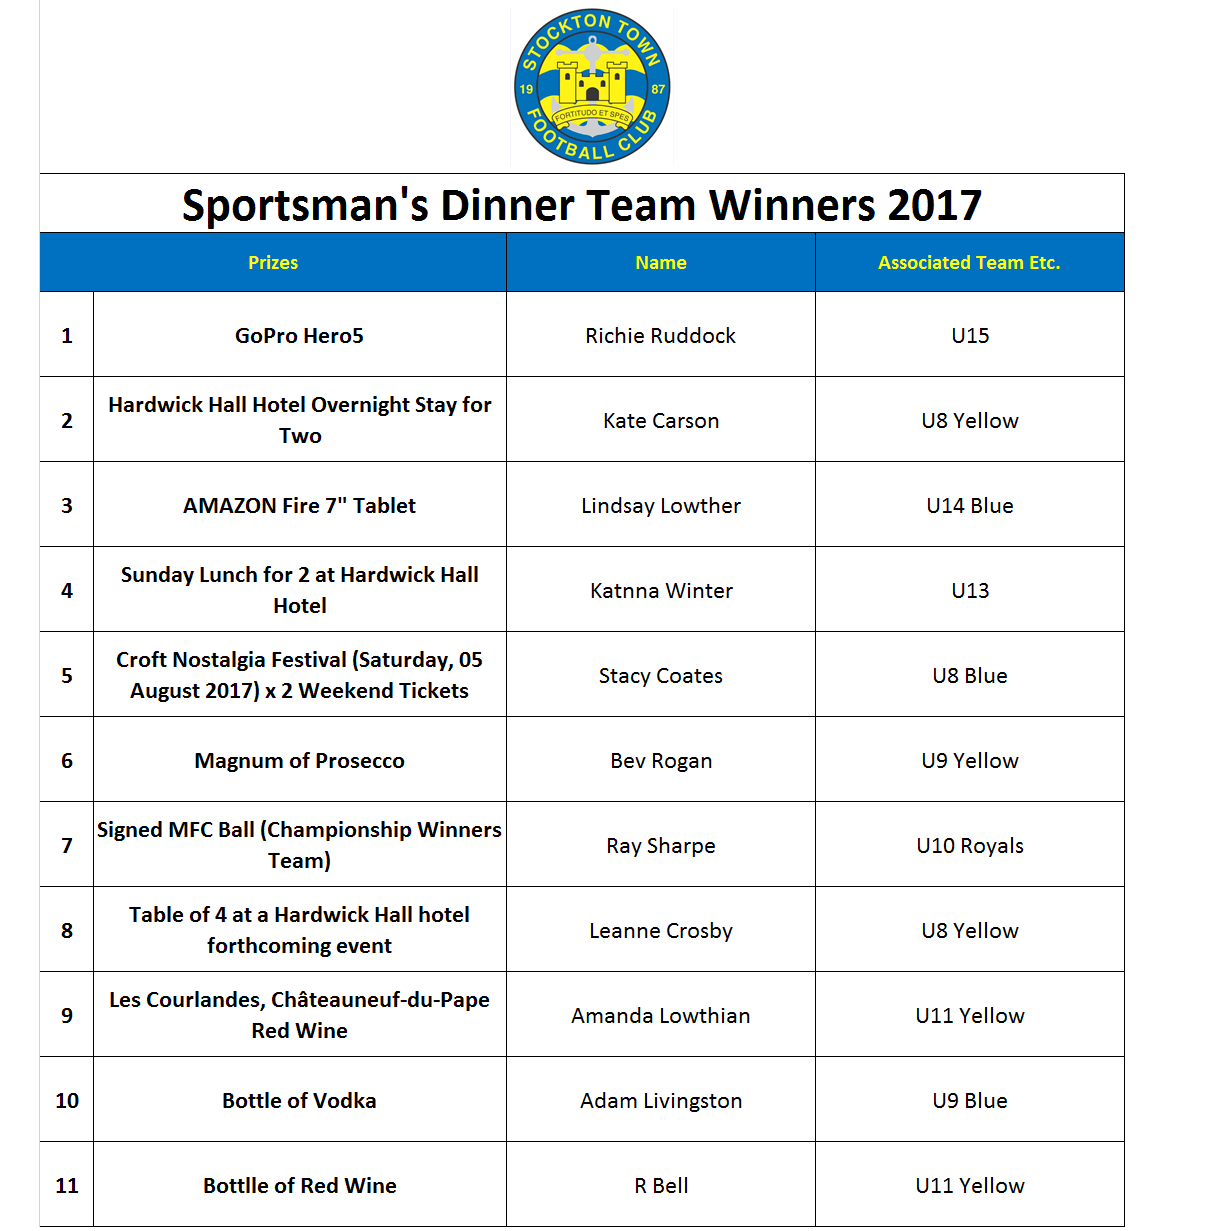 Team Winners 2017